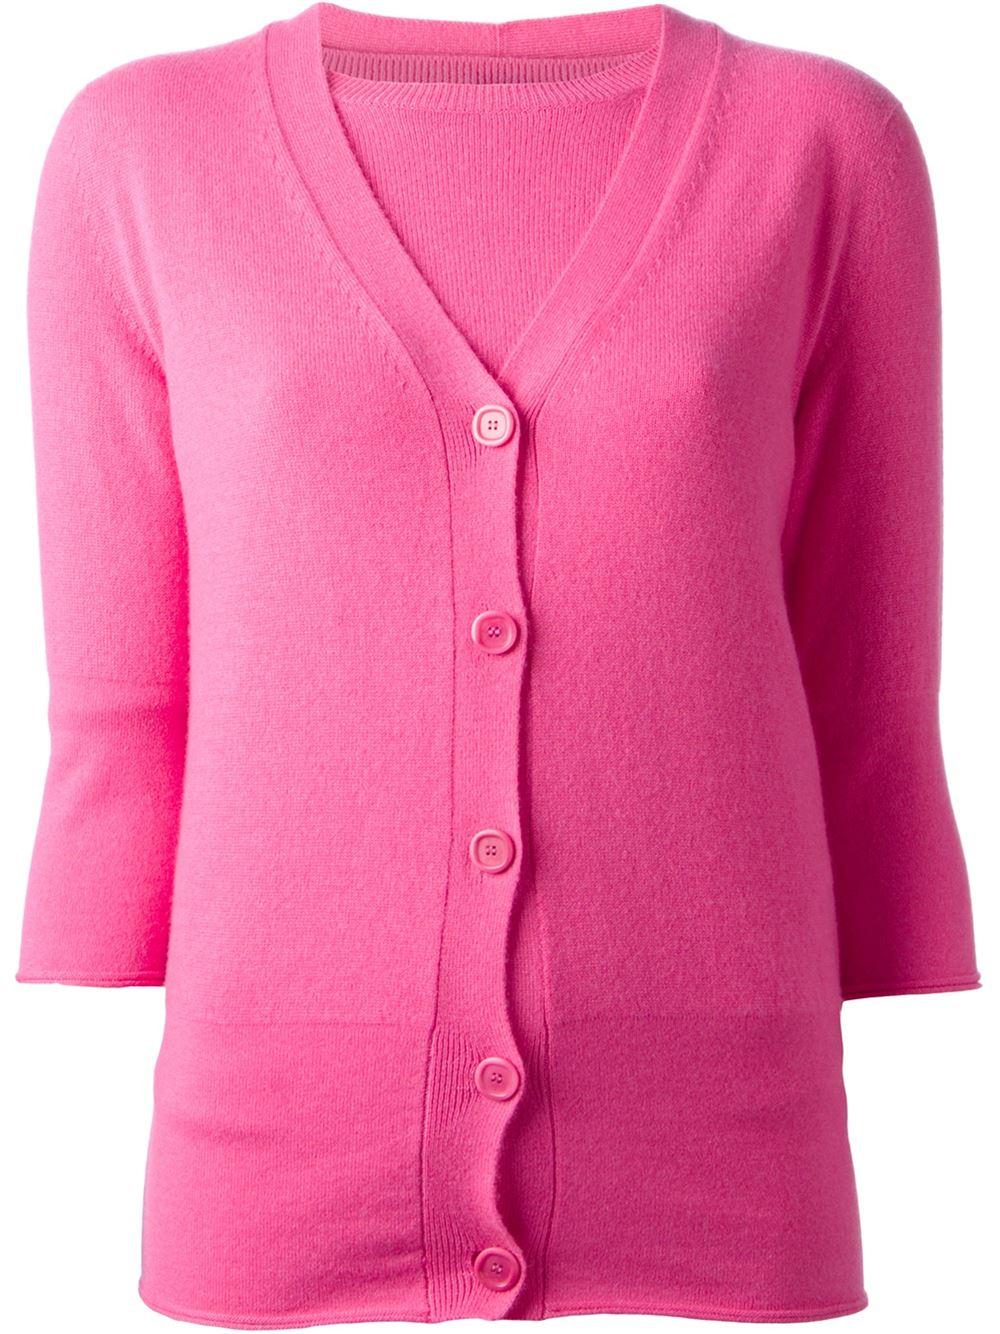 Women'S Pink Cardigan Sweater 82